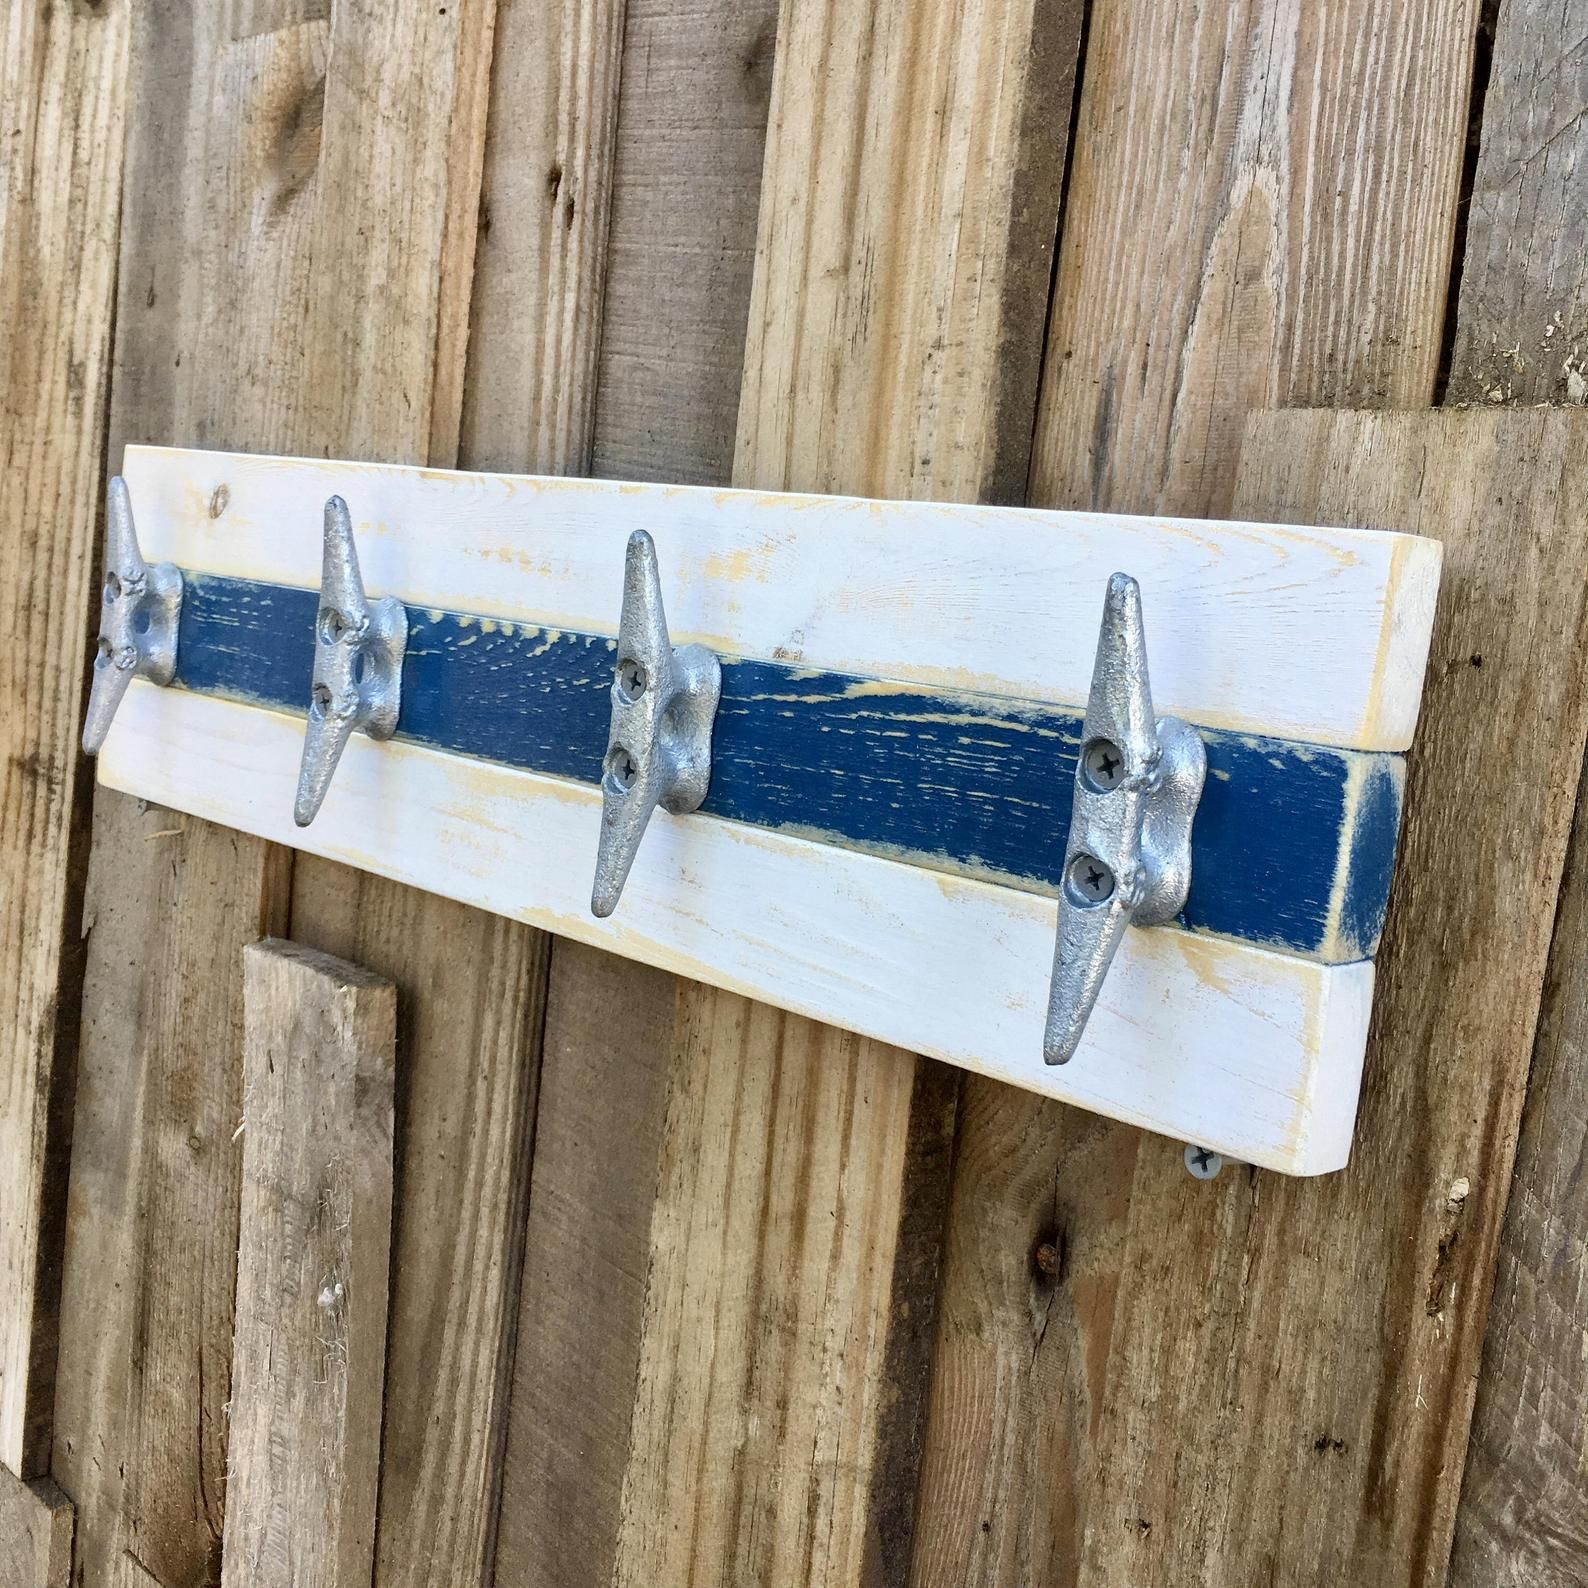 Boat Cleat Coat Rack Nautical Towel Rack Hat Rack Book Bag Rack Key Rack Distressed White And Blue Boat Cleat Towel Rack Boat Cleats Nautical Towel